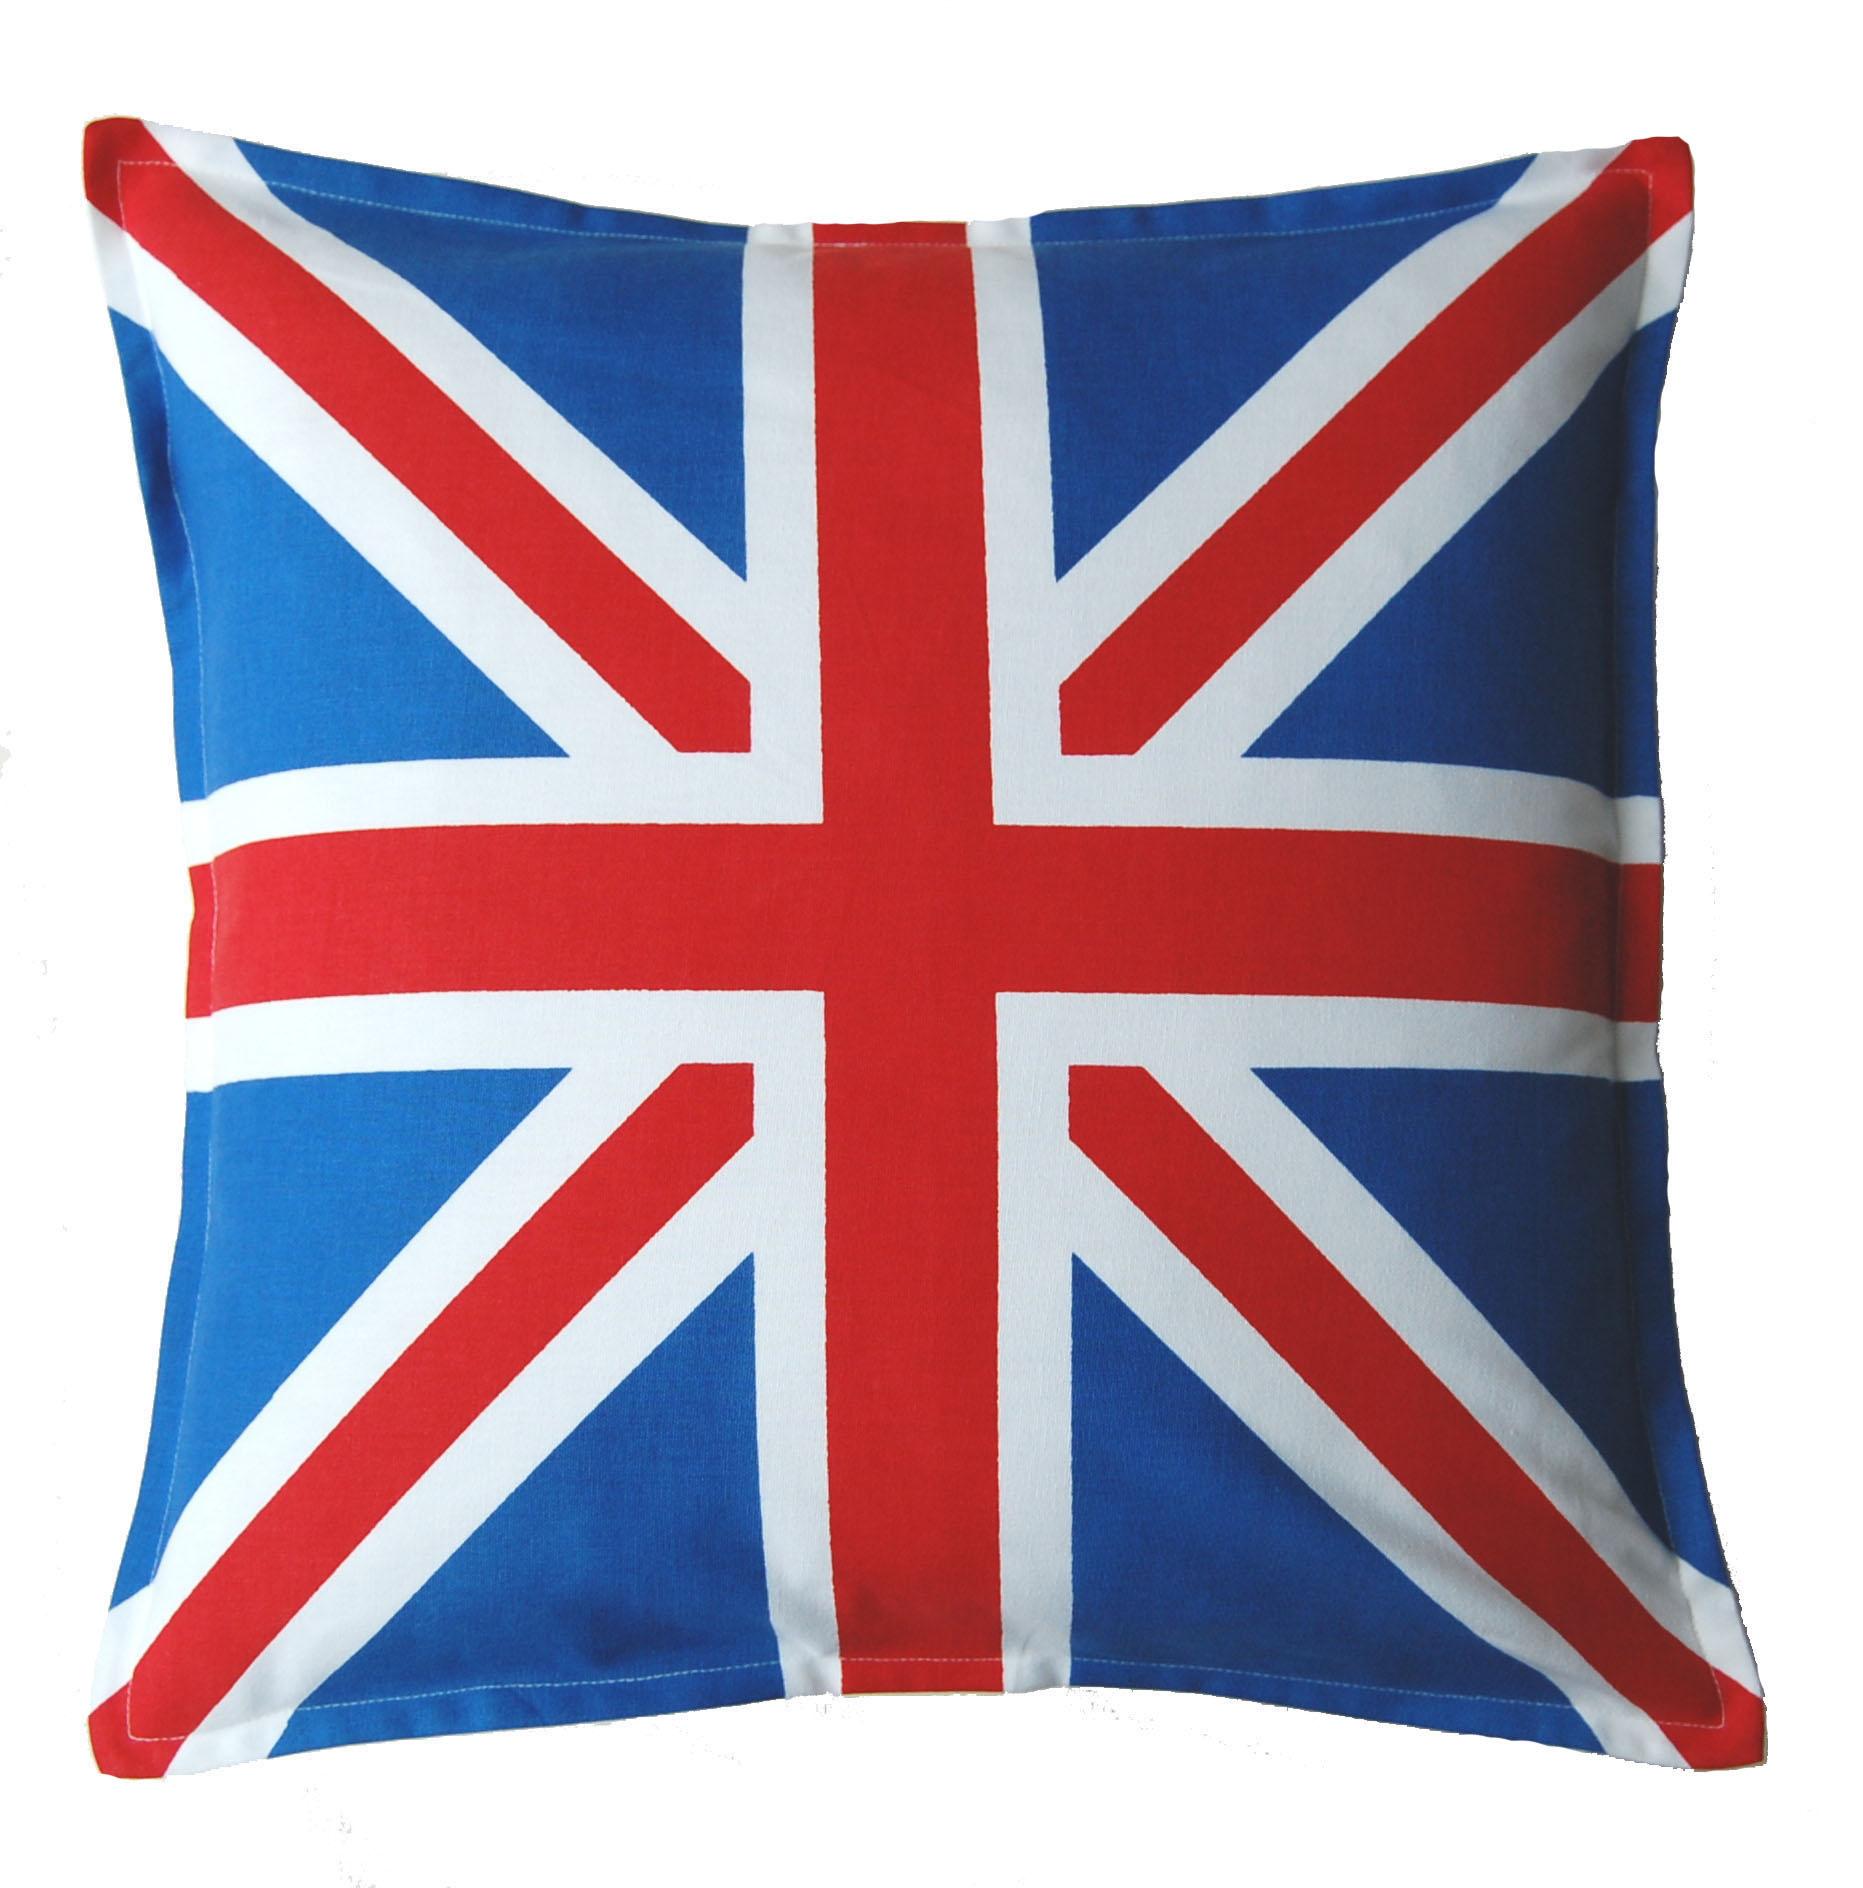 Free Knitting Pattern For Union Jack Cushion Cover : Great Britain Cushion Cover Union Jack Design 18